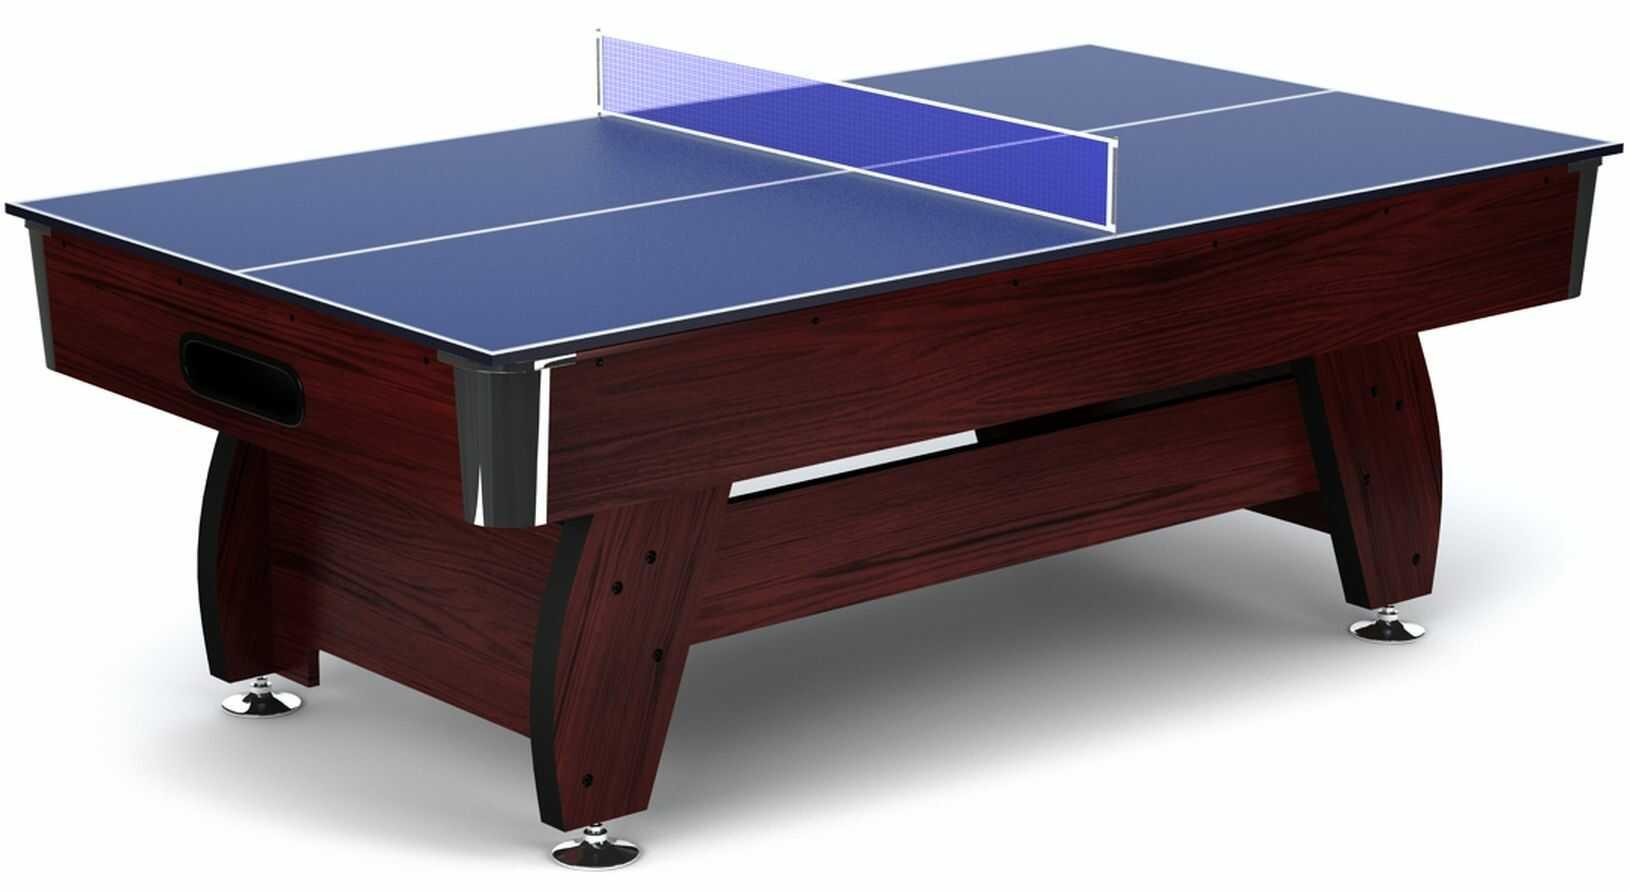 Nakładka Ping-Pong Blat na stół bilardowy 7ft Wiśnia